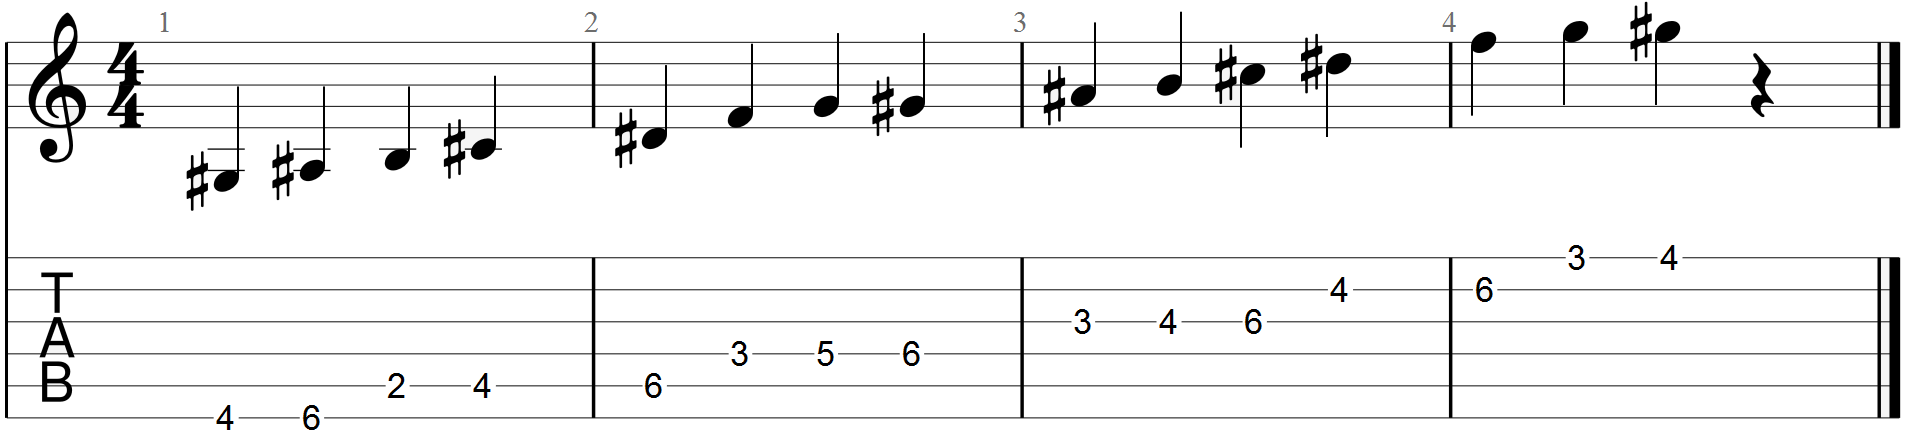 Horizontal fretboard improvising in c minor guitar chalk the melodic minor guitar scale diagram hexwebz Choice Image